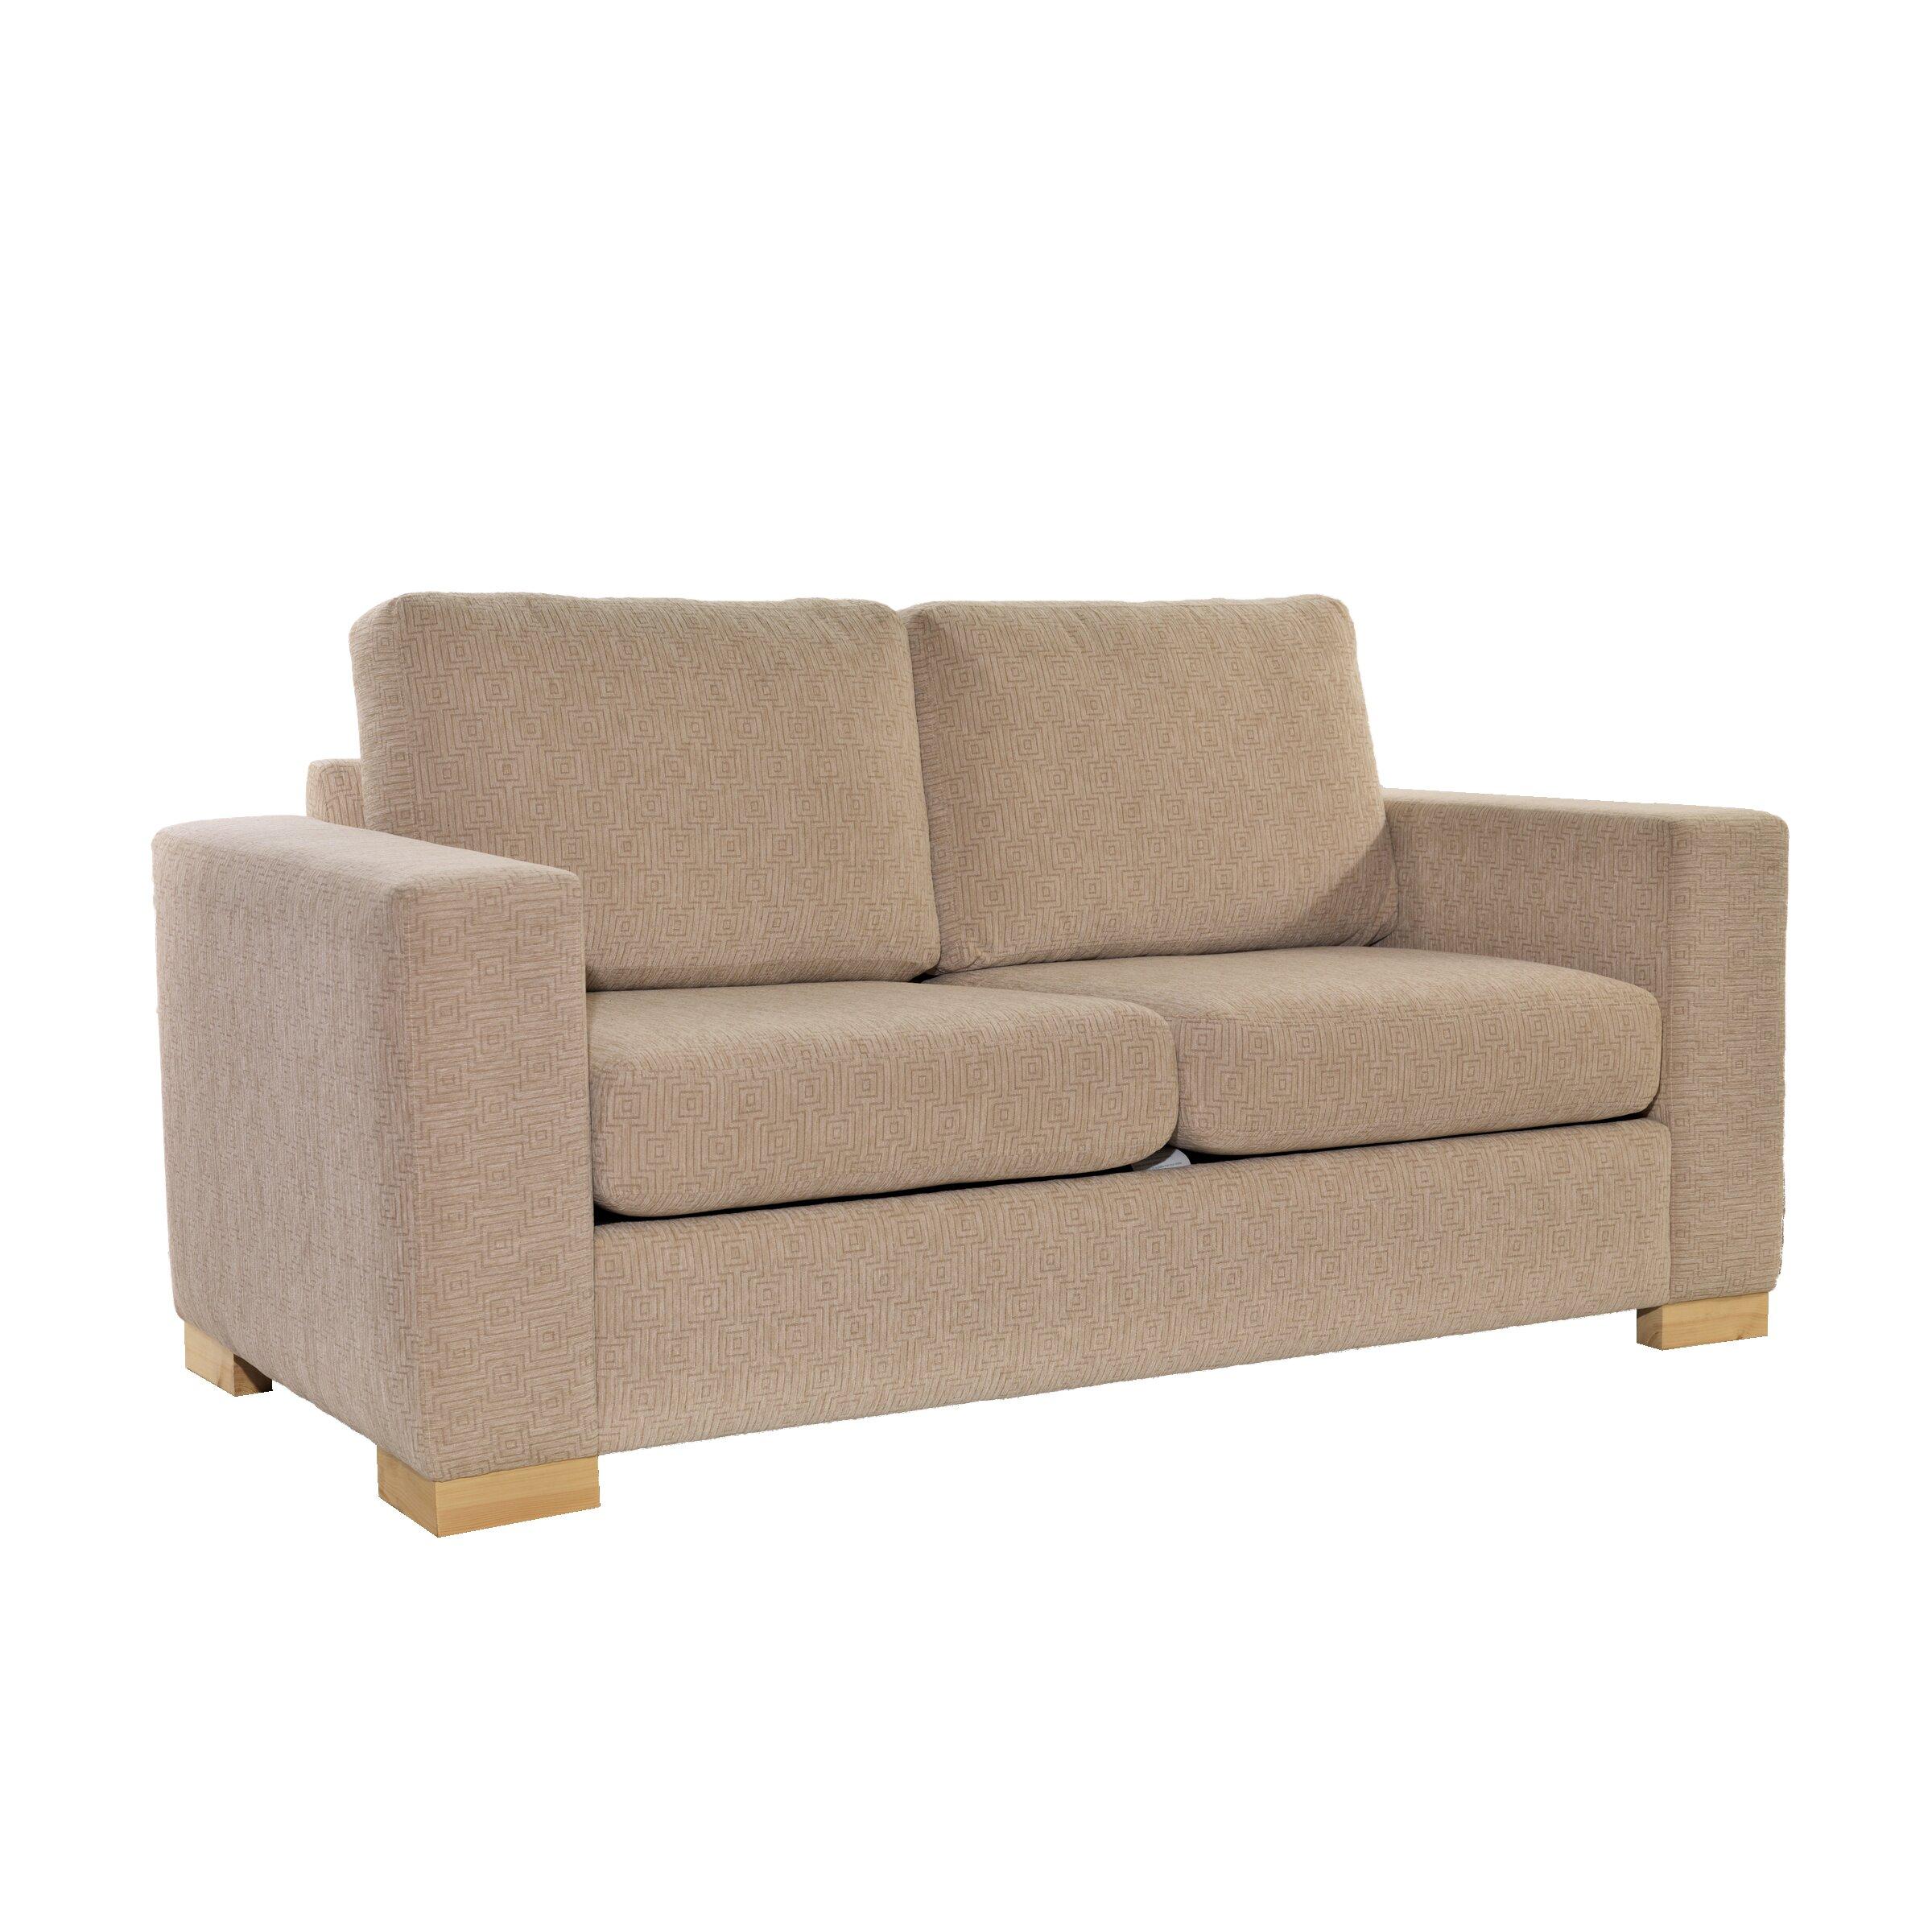 Uk Icon Design French 2 Seater Fold Out Sofa Wayfair Uk